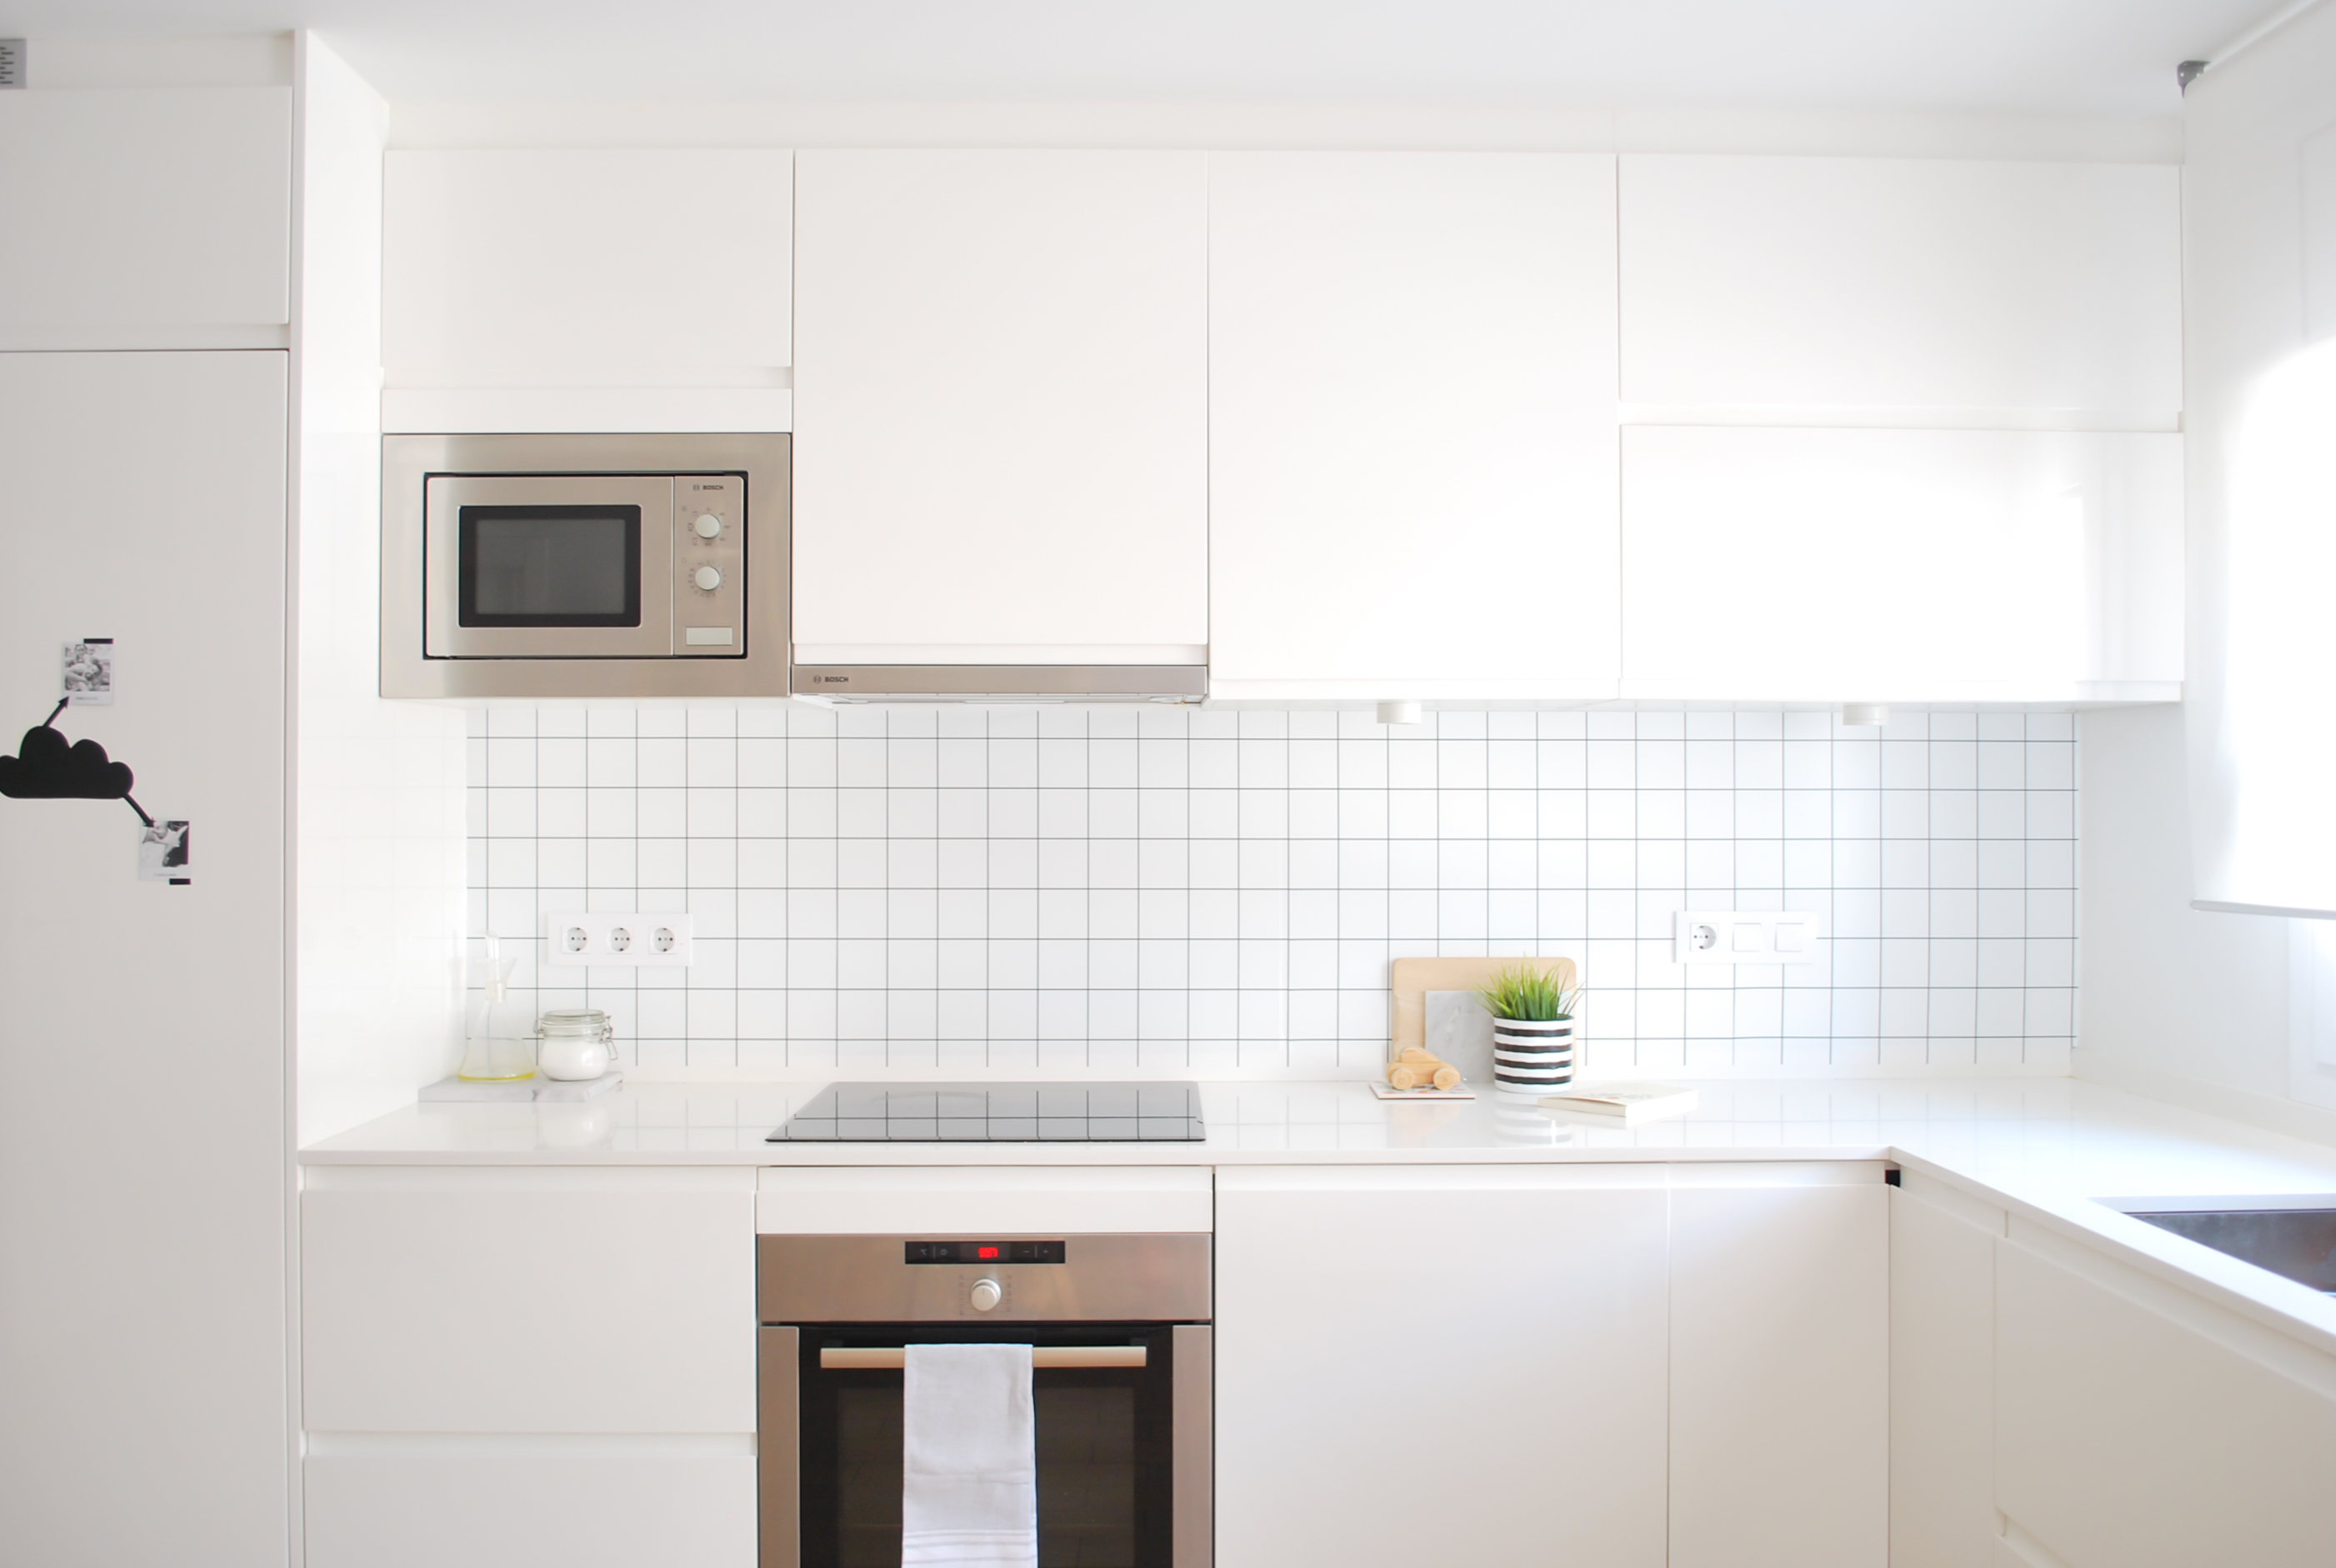 Ikea fregadero cocina nrdica con baldosa metro y encimera for Fregadero cocina ikea